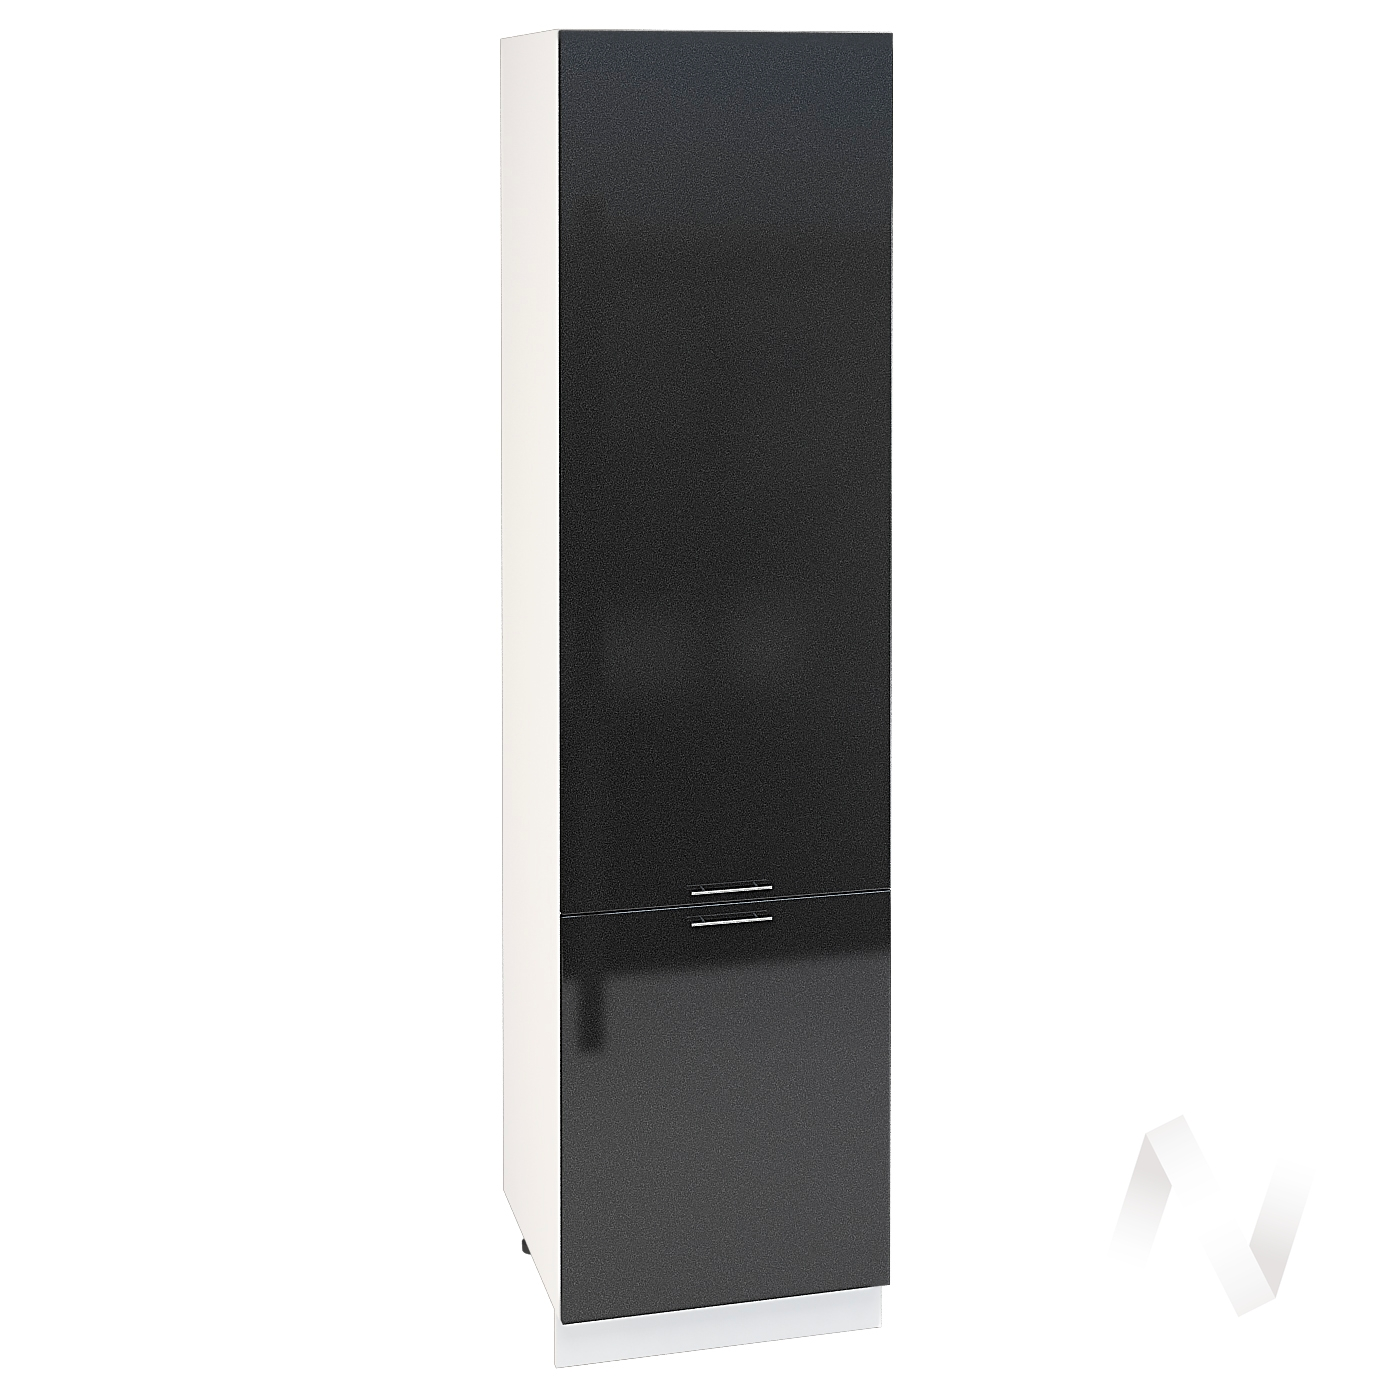 "Кухня ""Валерия-М"": Шкаф пенал 600, ШП 600 НМ (черный металлик/корпус белый)"